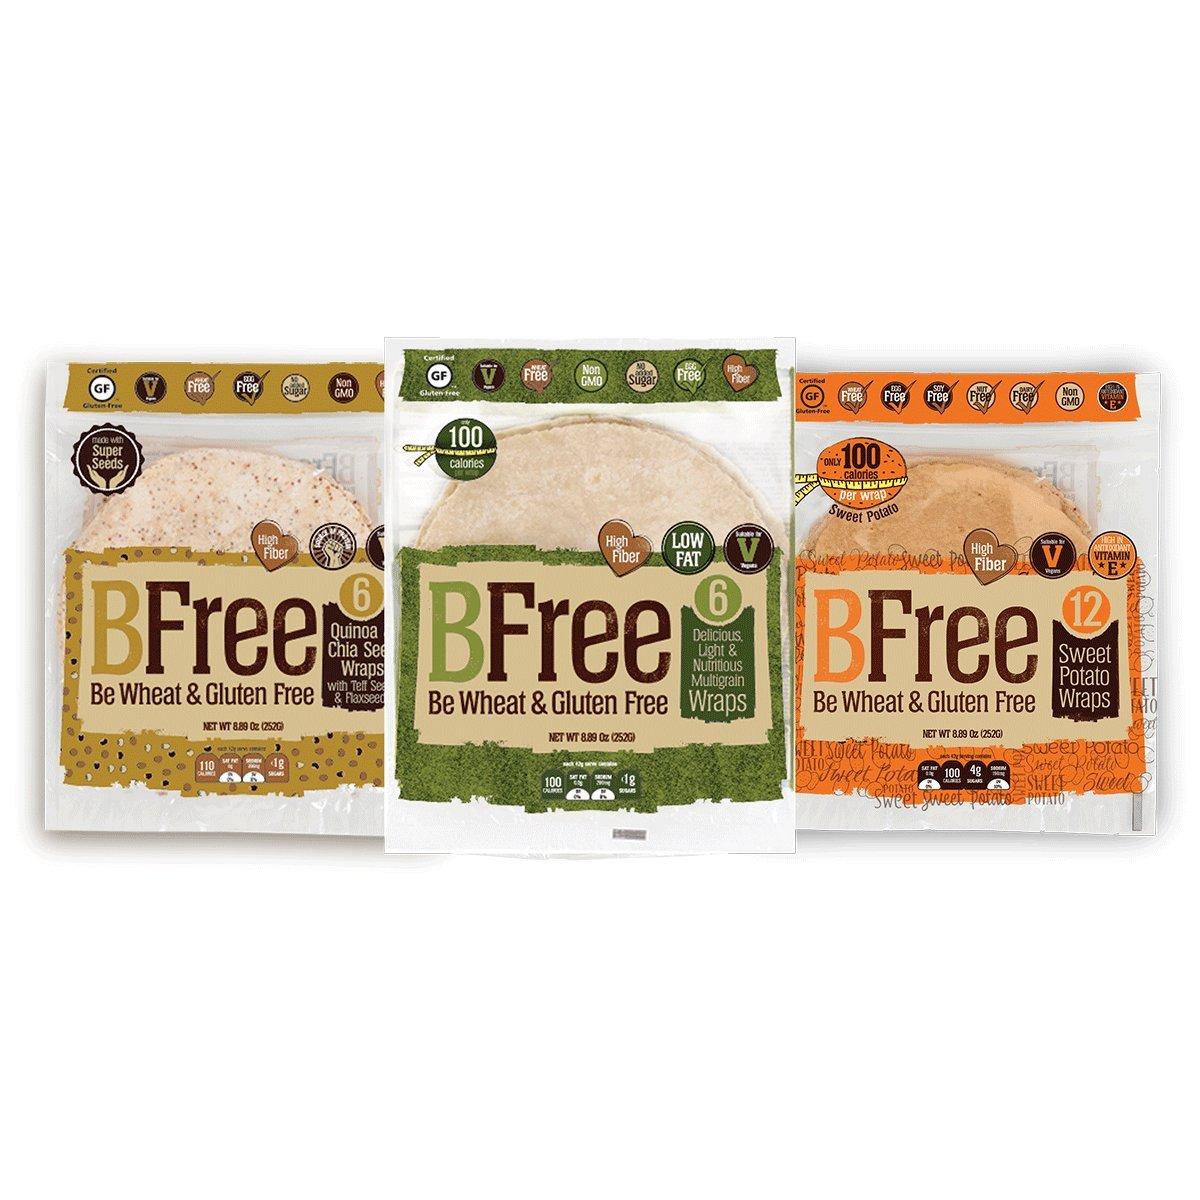 Bfree Gluten Free Wrap Tortillas Variety Pack 8'' Sweet Potato, Multigrain, Quinoa, Wraps Variety by Bfree